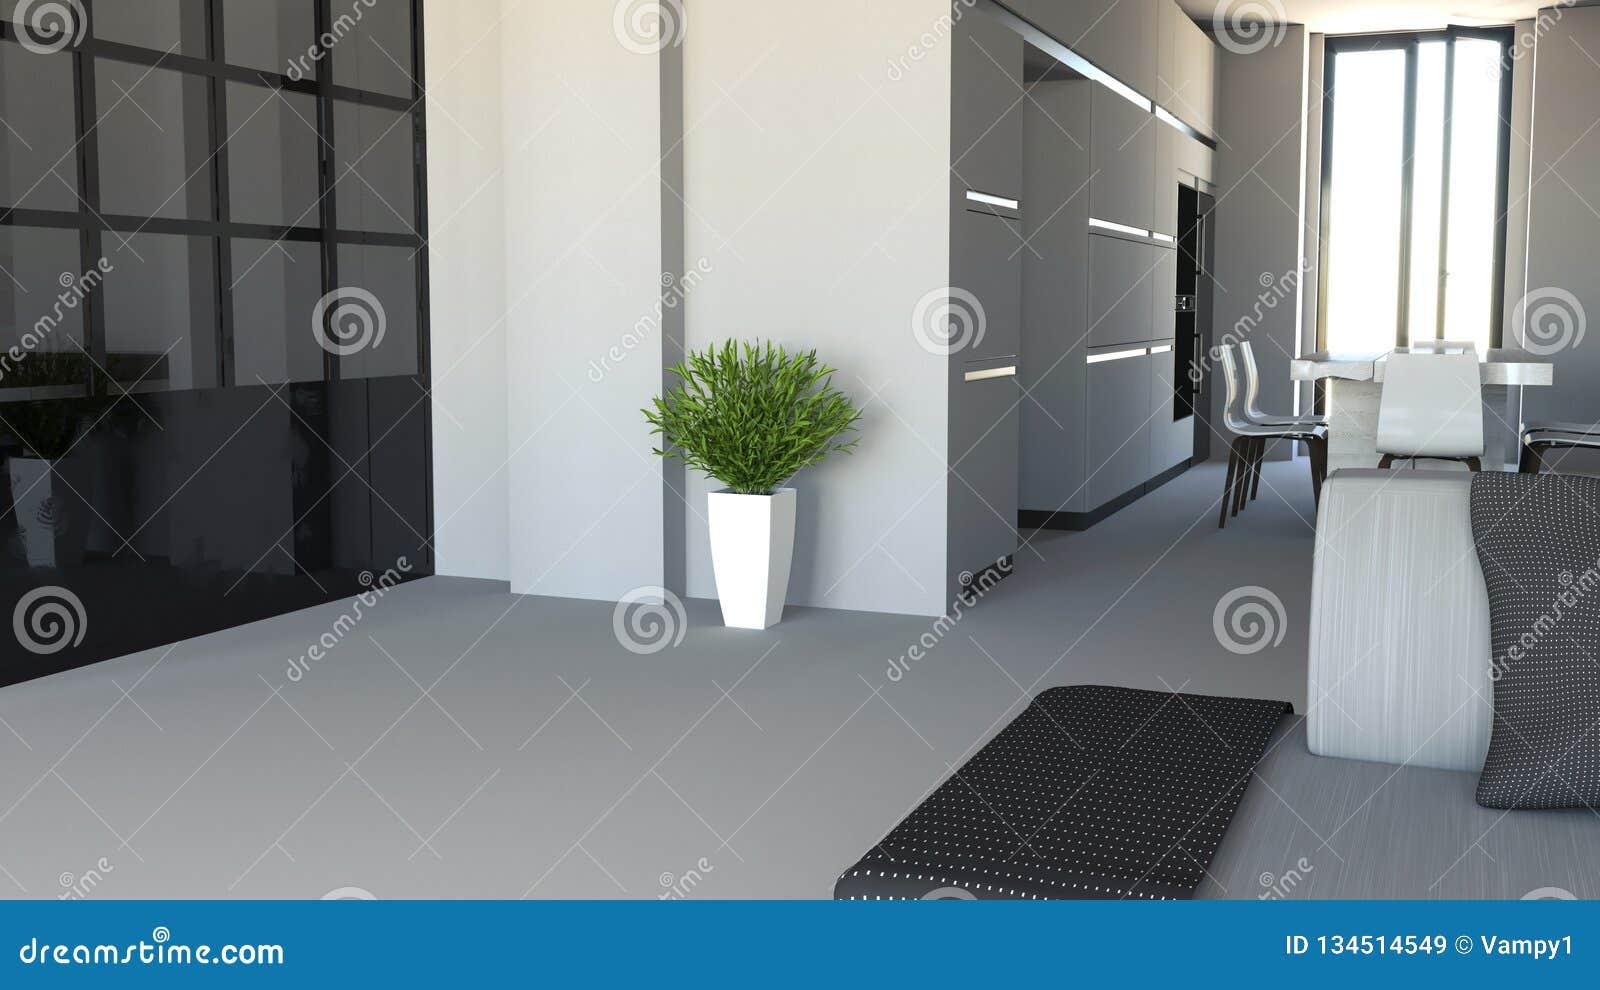 Living Room And Kitchen Furniture Interior Design